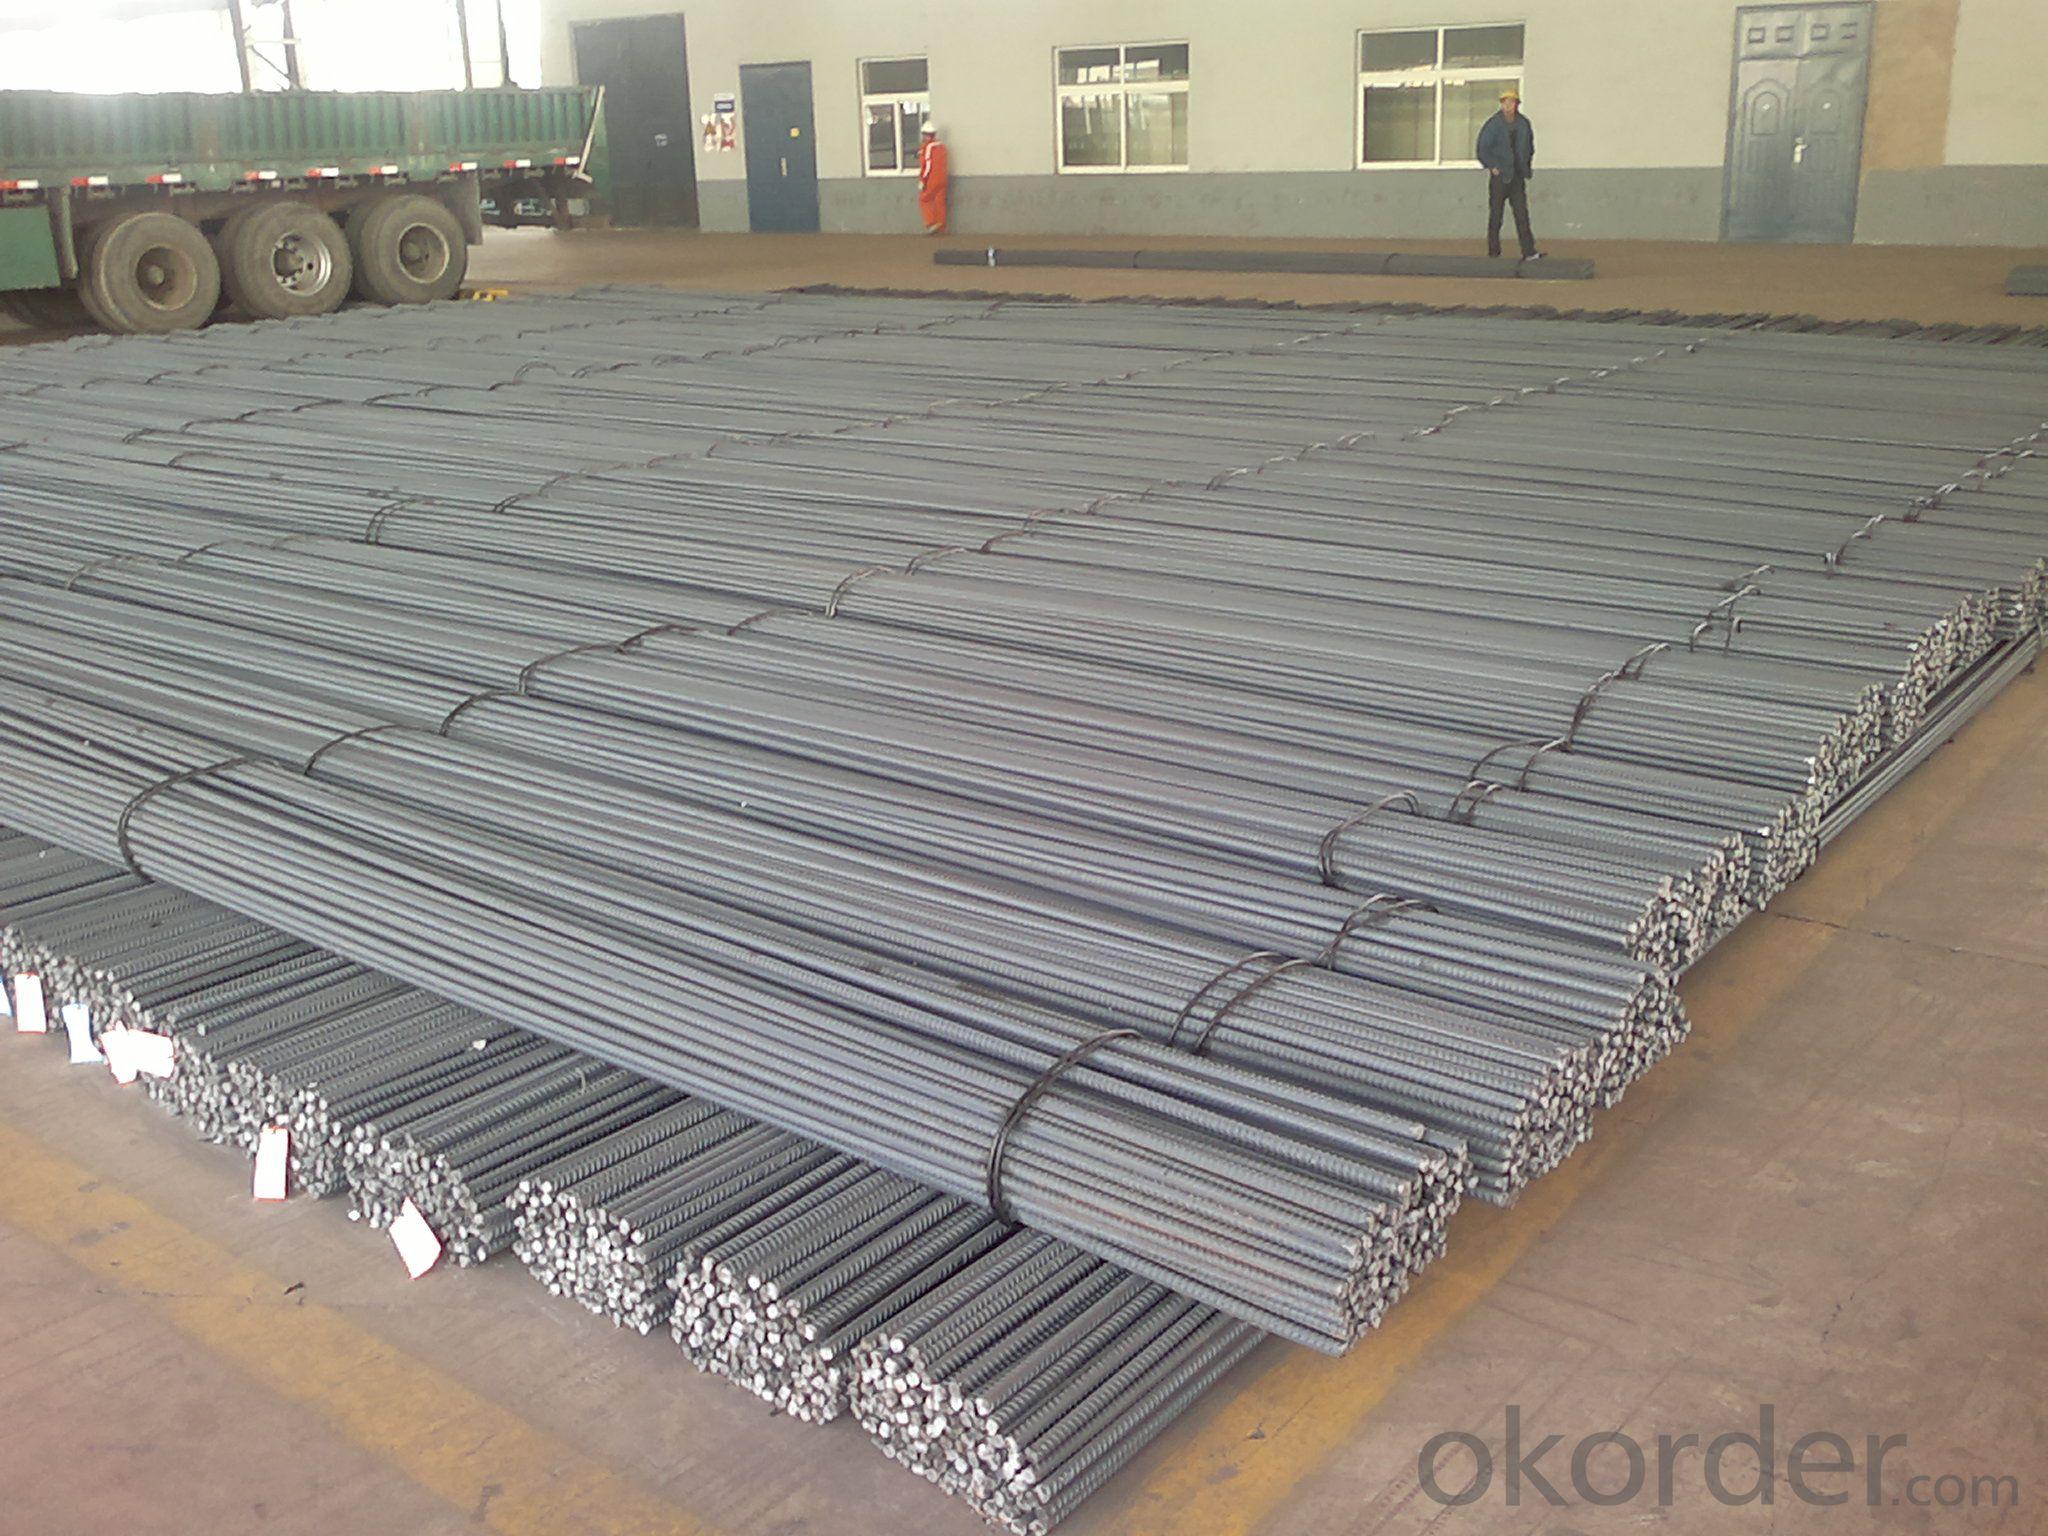 GB/UK/USA STANDARD Deformed Steel Bar